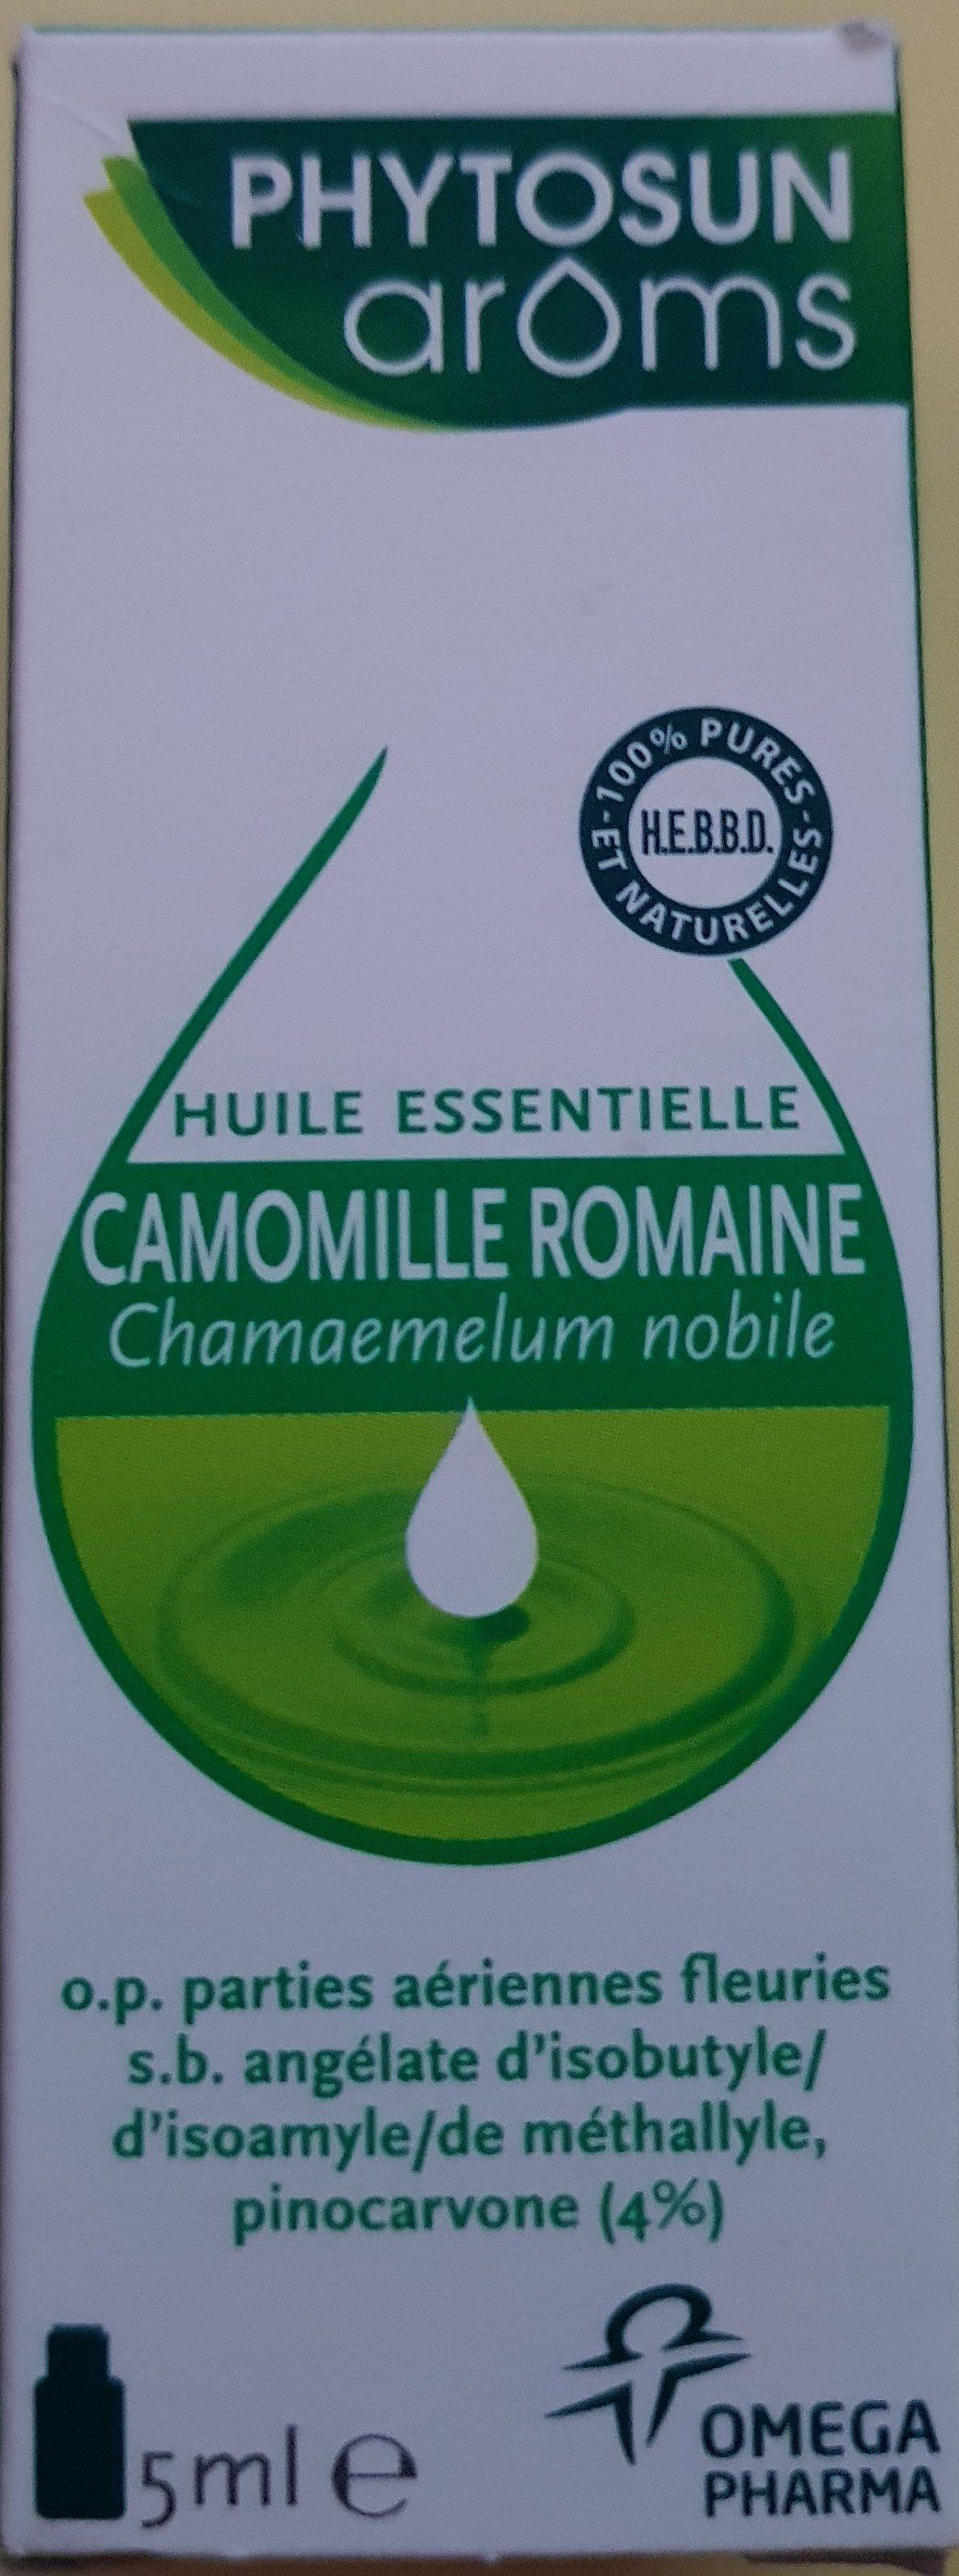 Huile Essentielle de Camomille Romaine - Product - fr